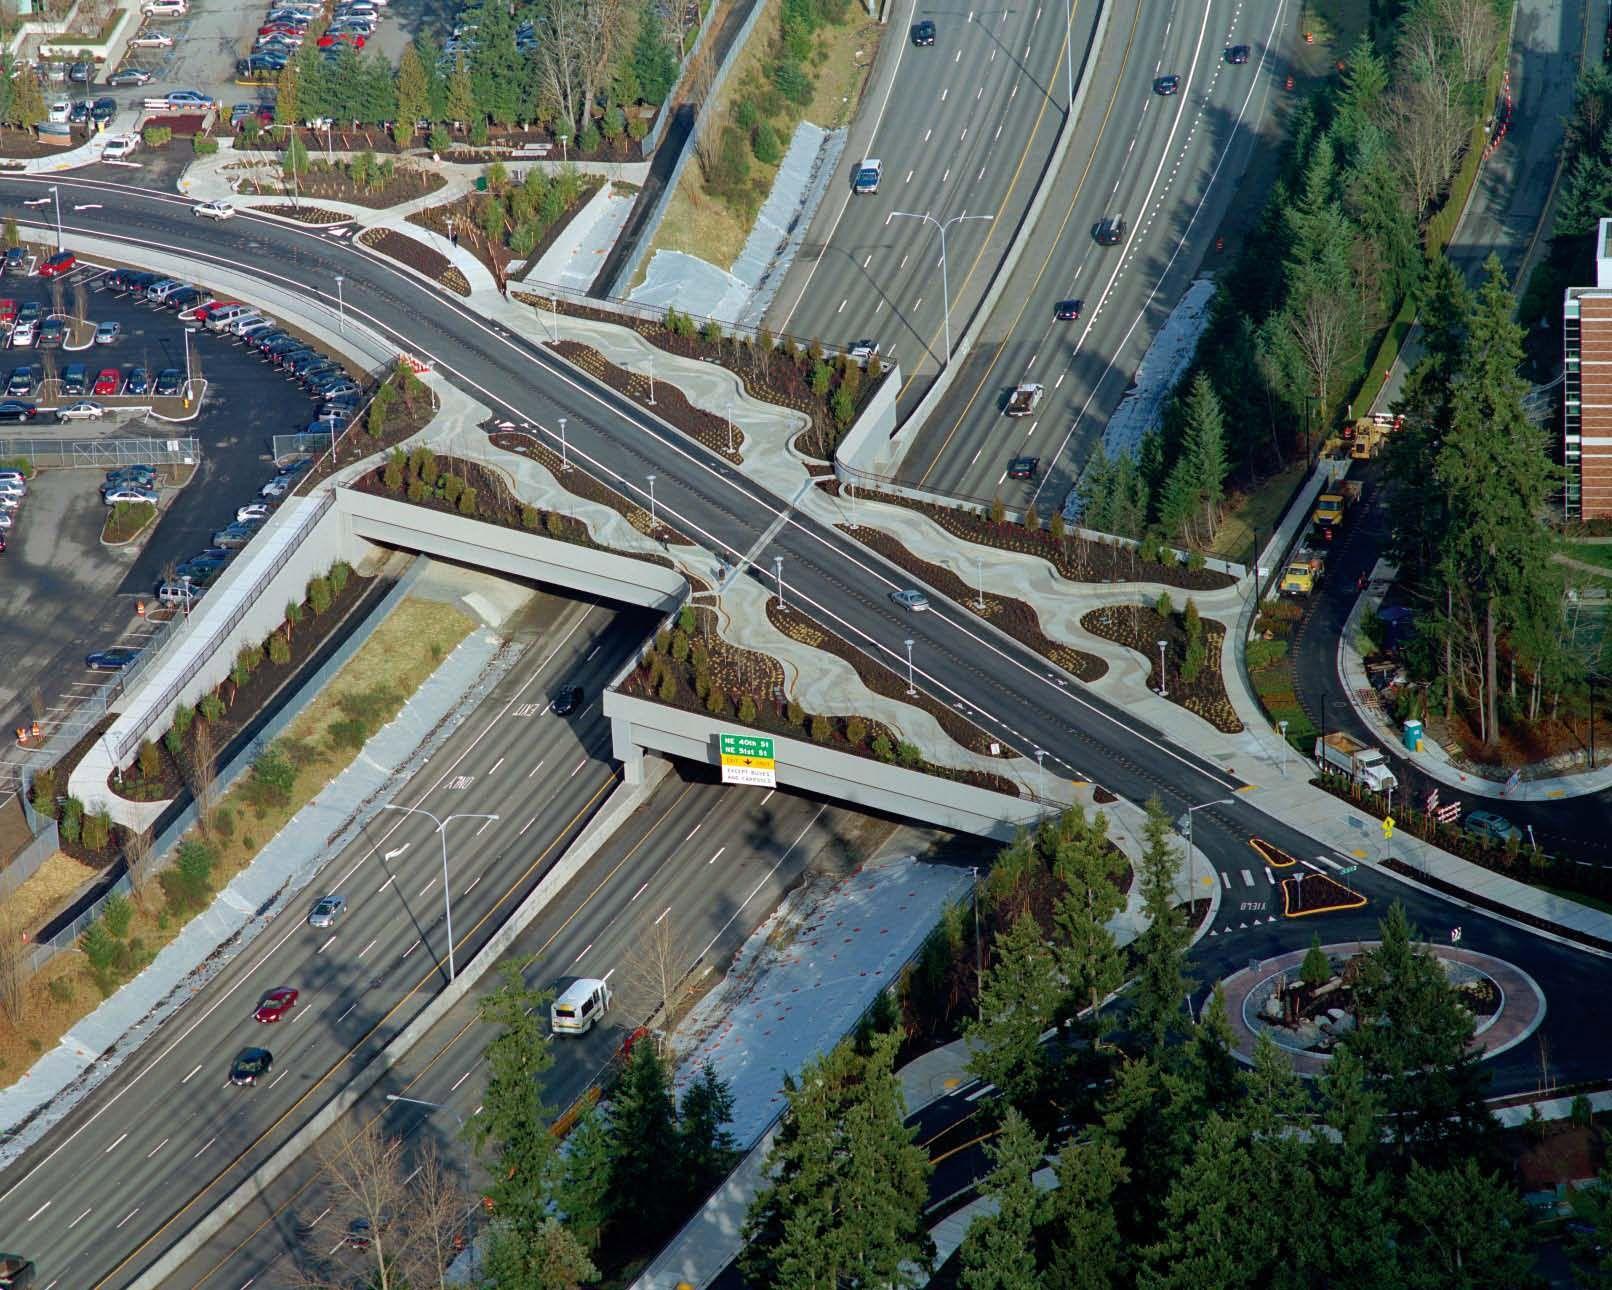 Washington NE 36th Street Bridge Roundabout - Bomanite Imprint Systems - Bomacron Creek Stone Pattern